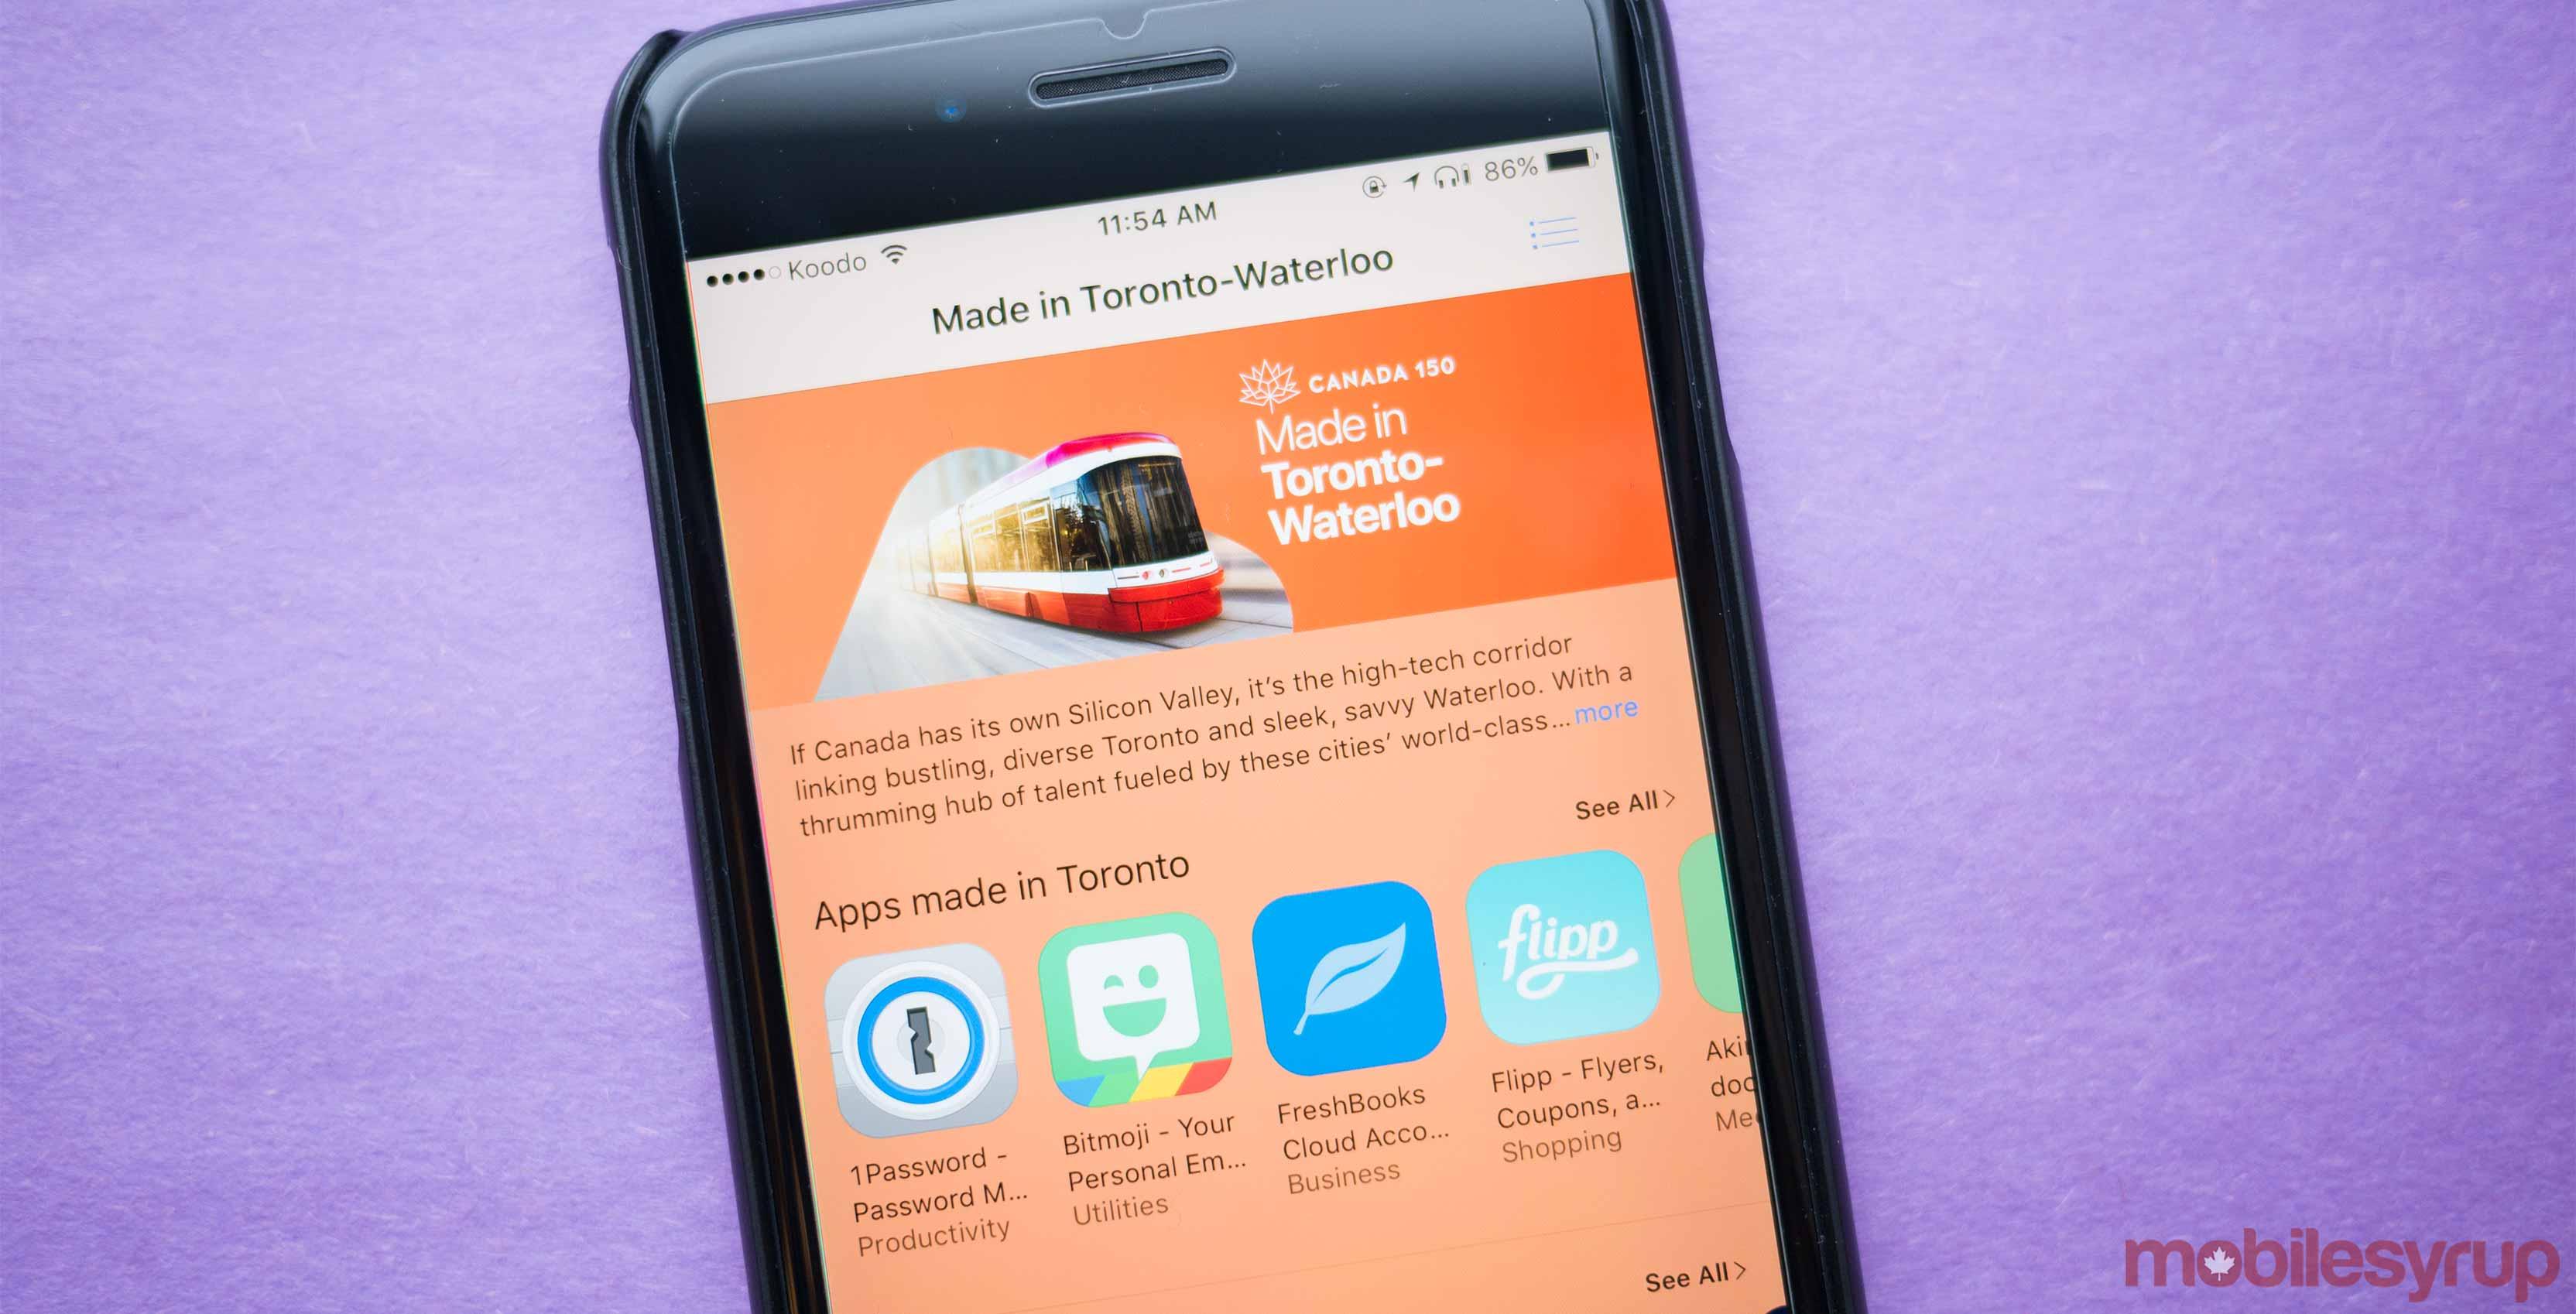 Toronto-Waterloo App Store